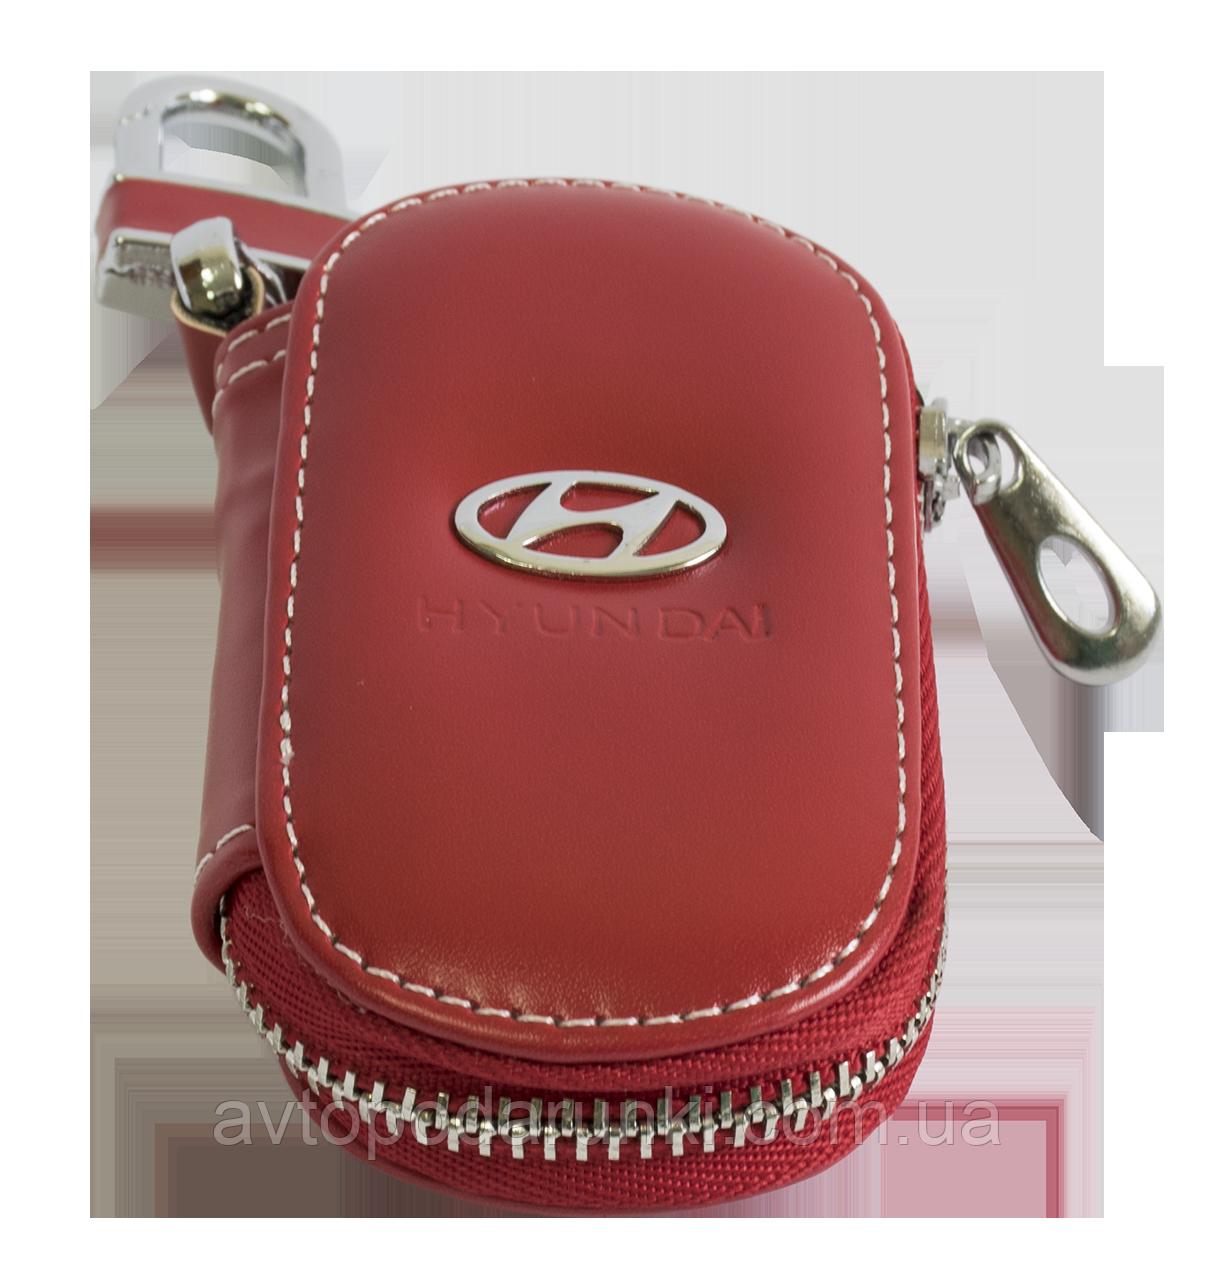 Ключница HYUNDAI, кожаная автоключница с логотипом  ХЮНДАЙ (красная 10015)